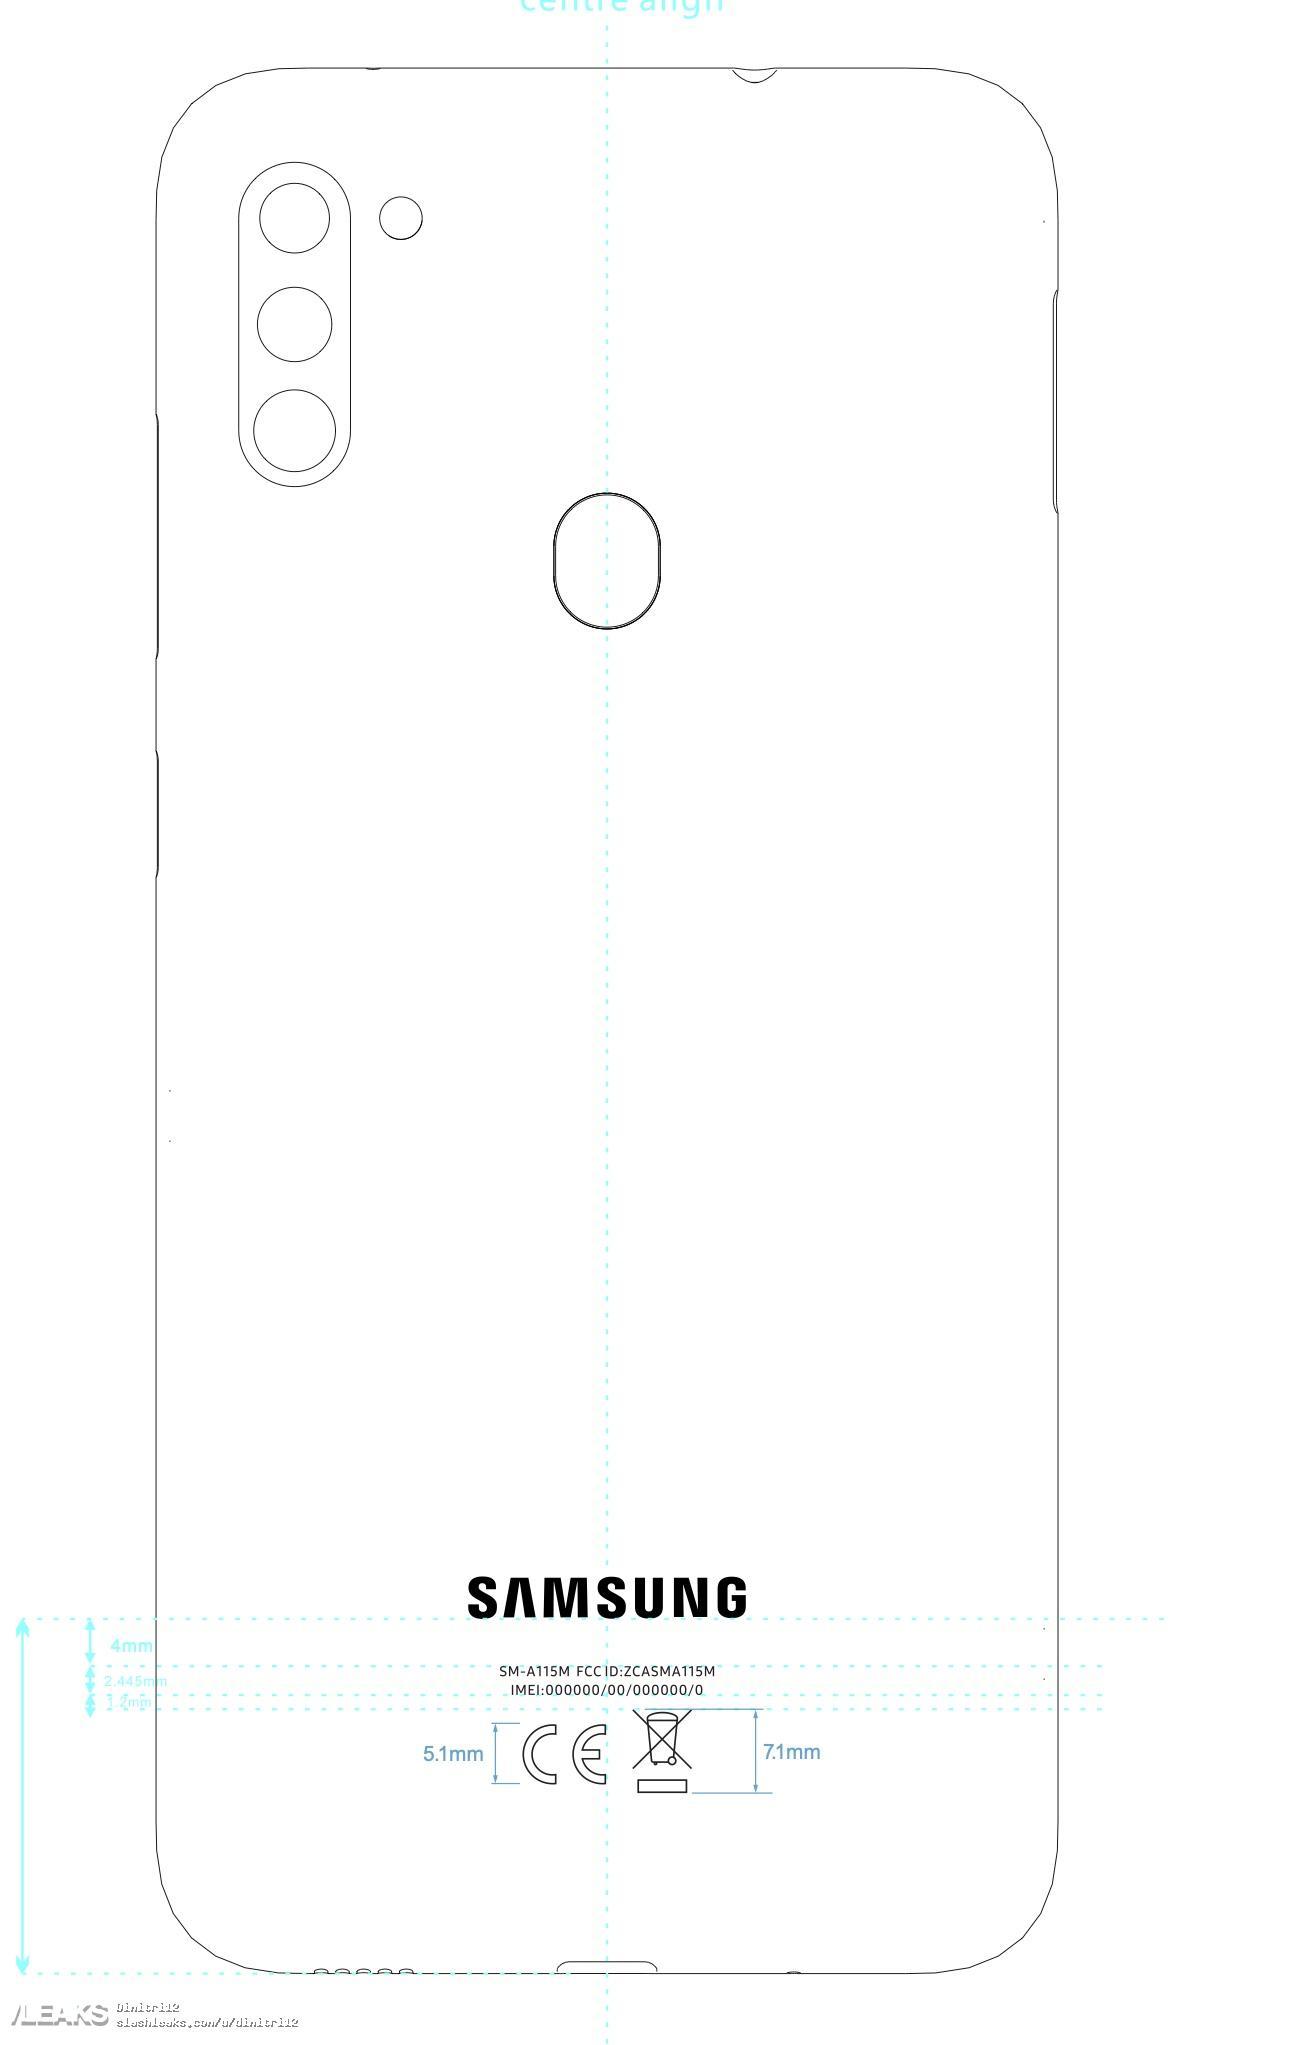 img Galaxy A11 (SM-A115M) schematics leaked by FCC